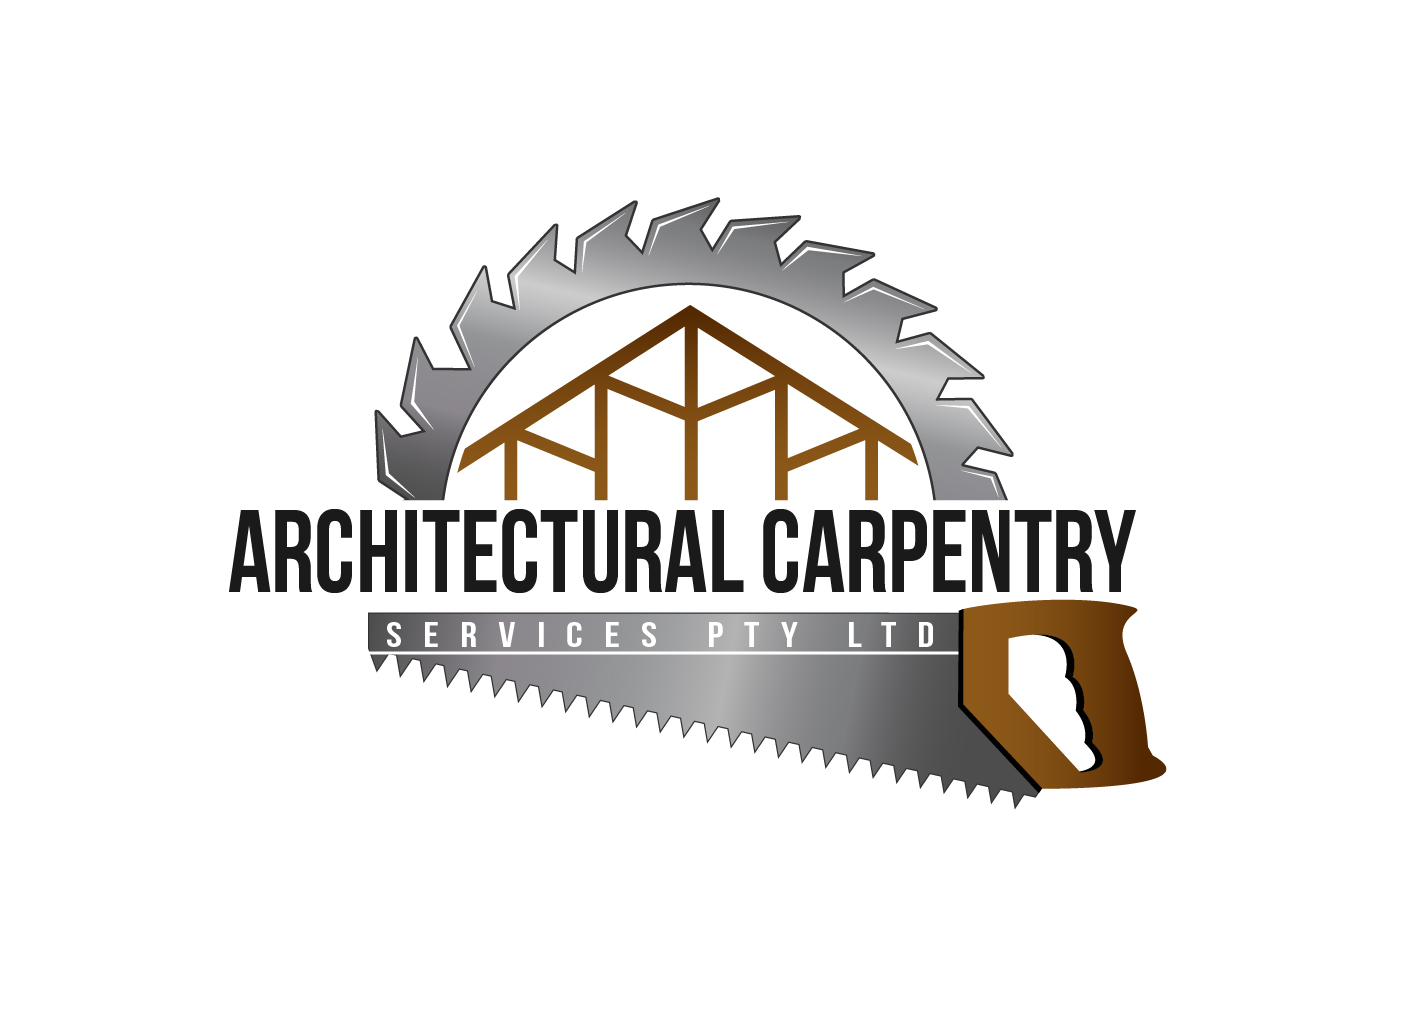 Logo Design for Architectural carpentry services pty ltd ...